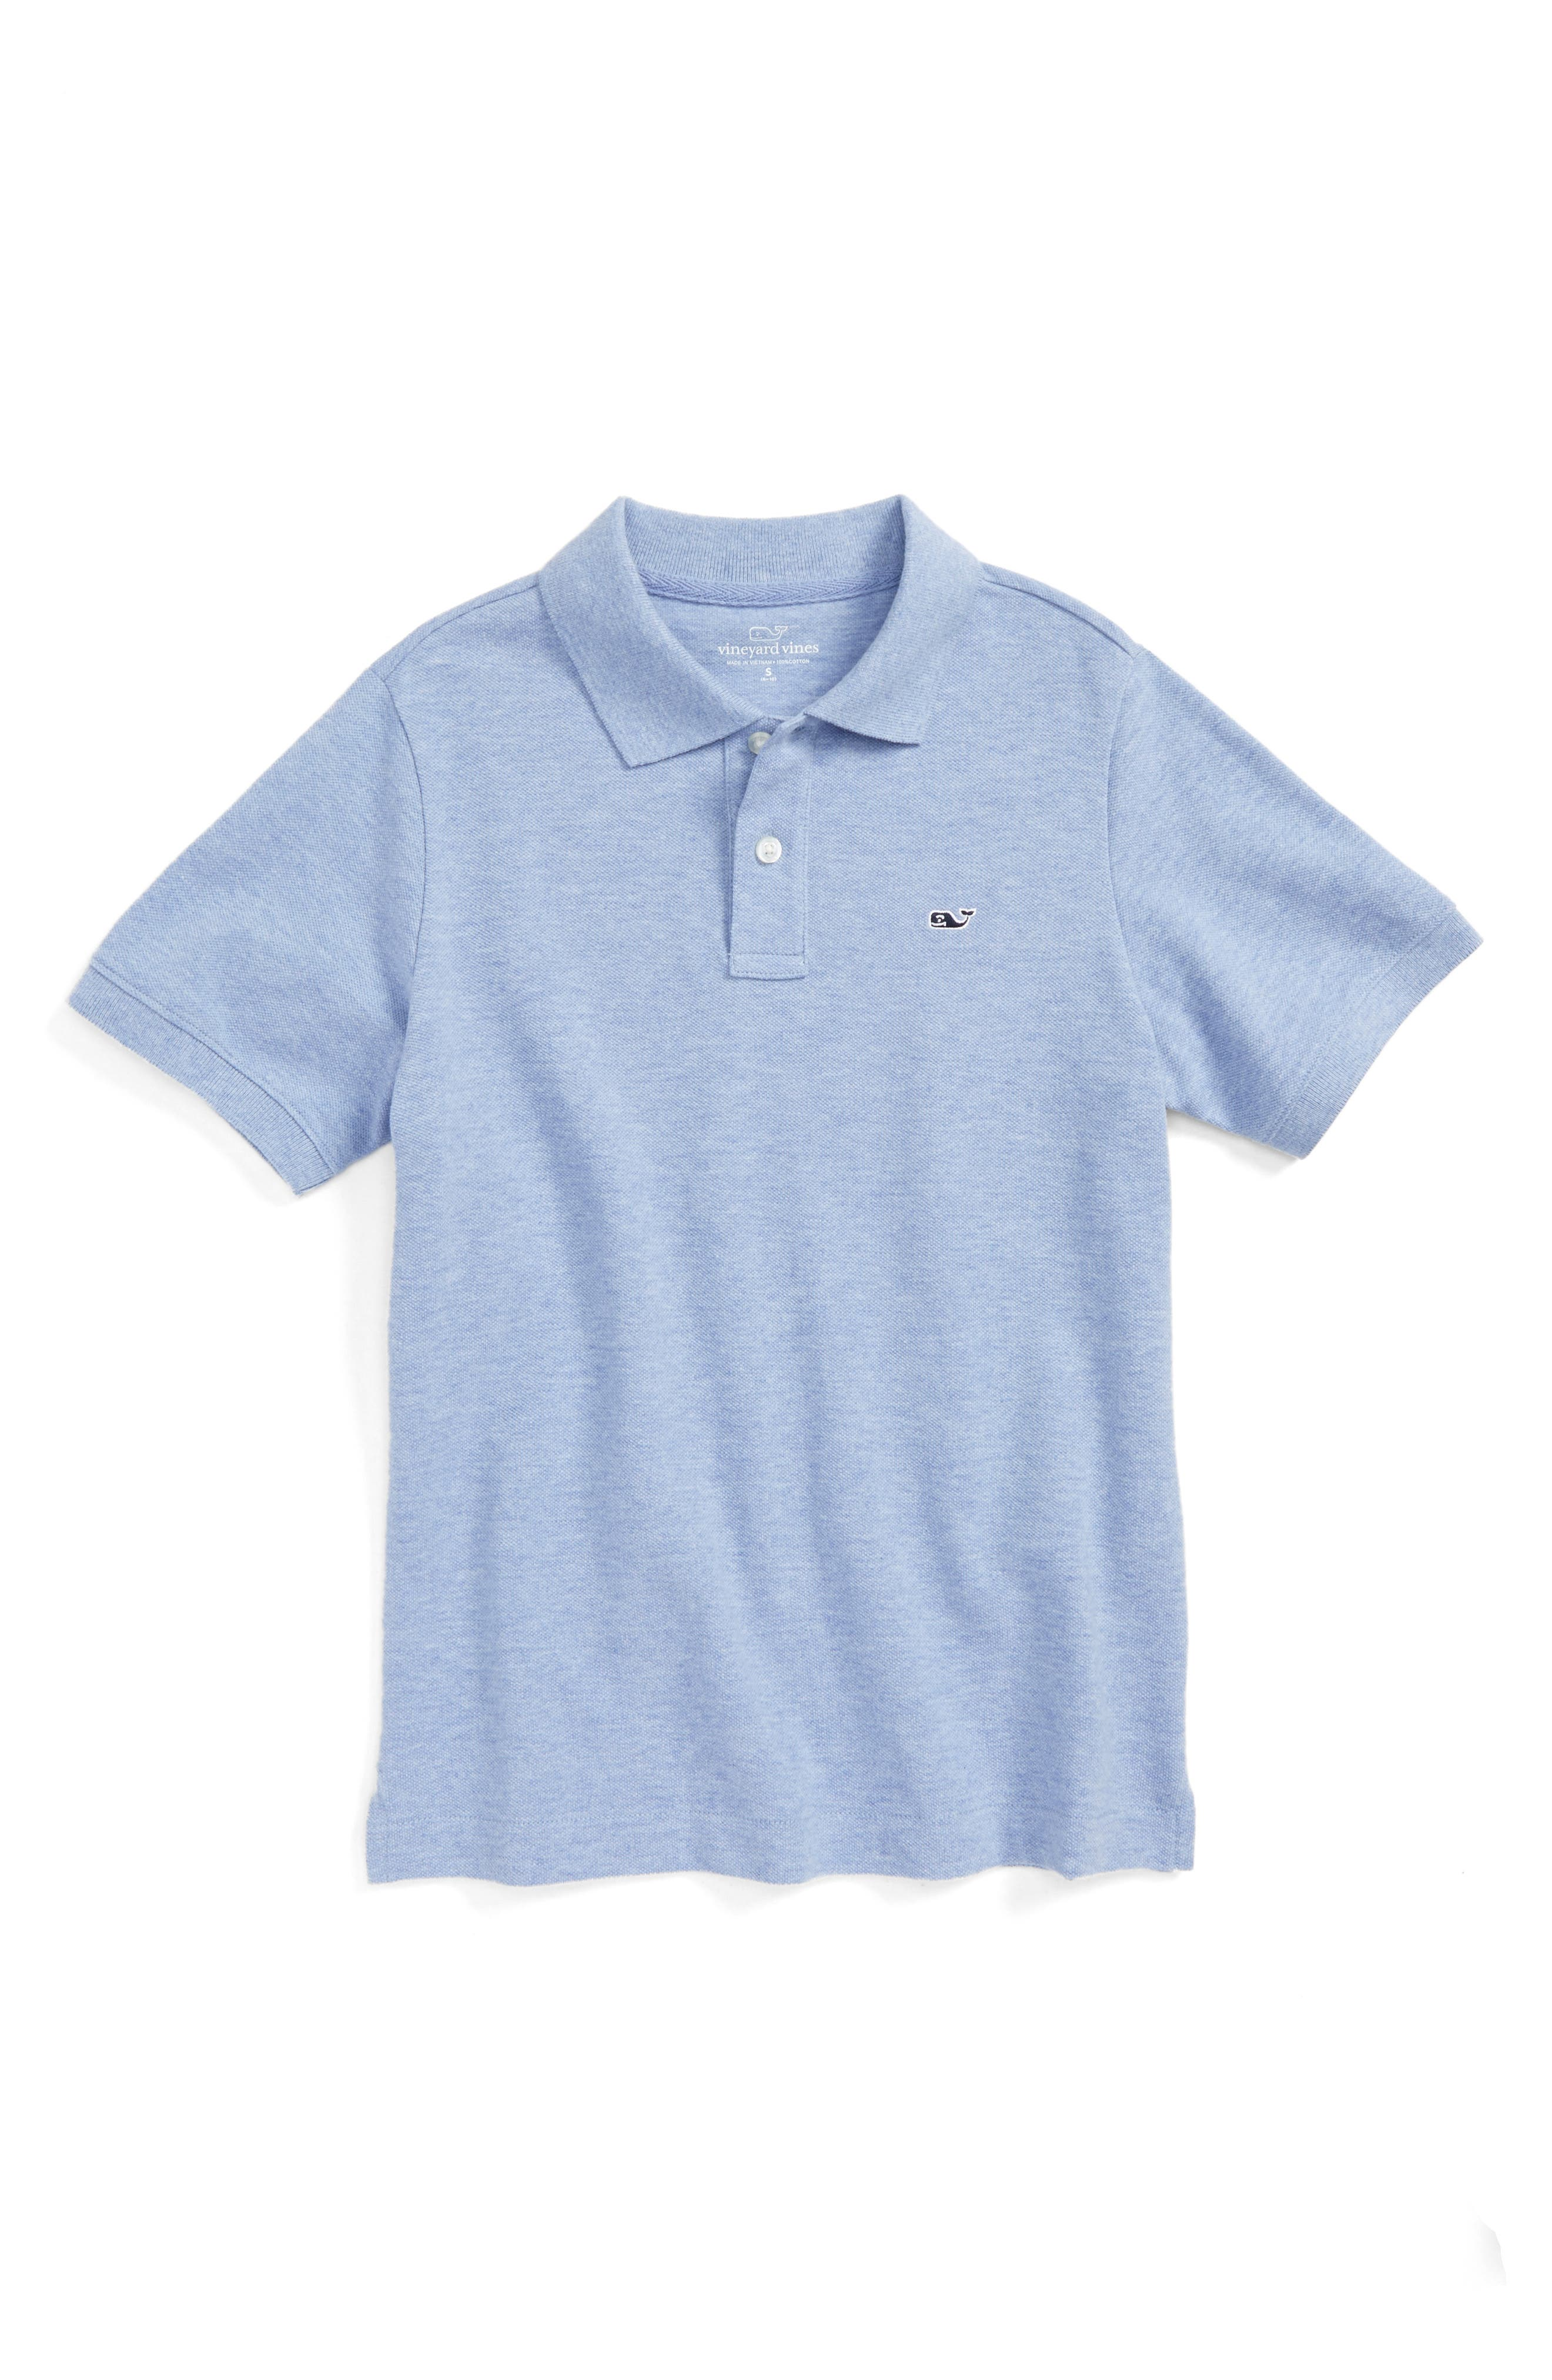 Classic Piqué Polo,                         Main,                         color, Dockside Blue